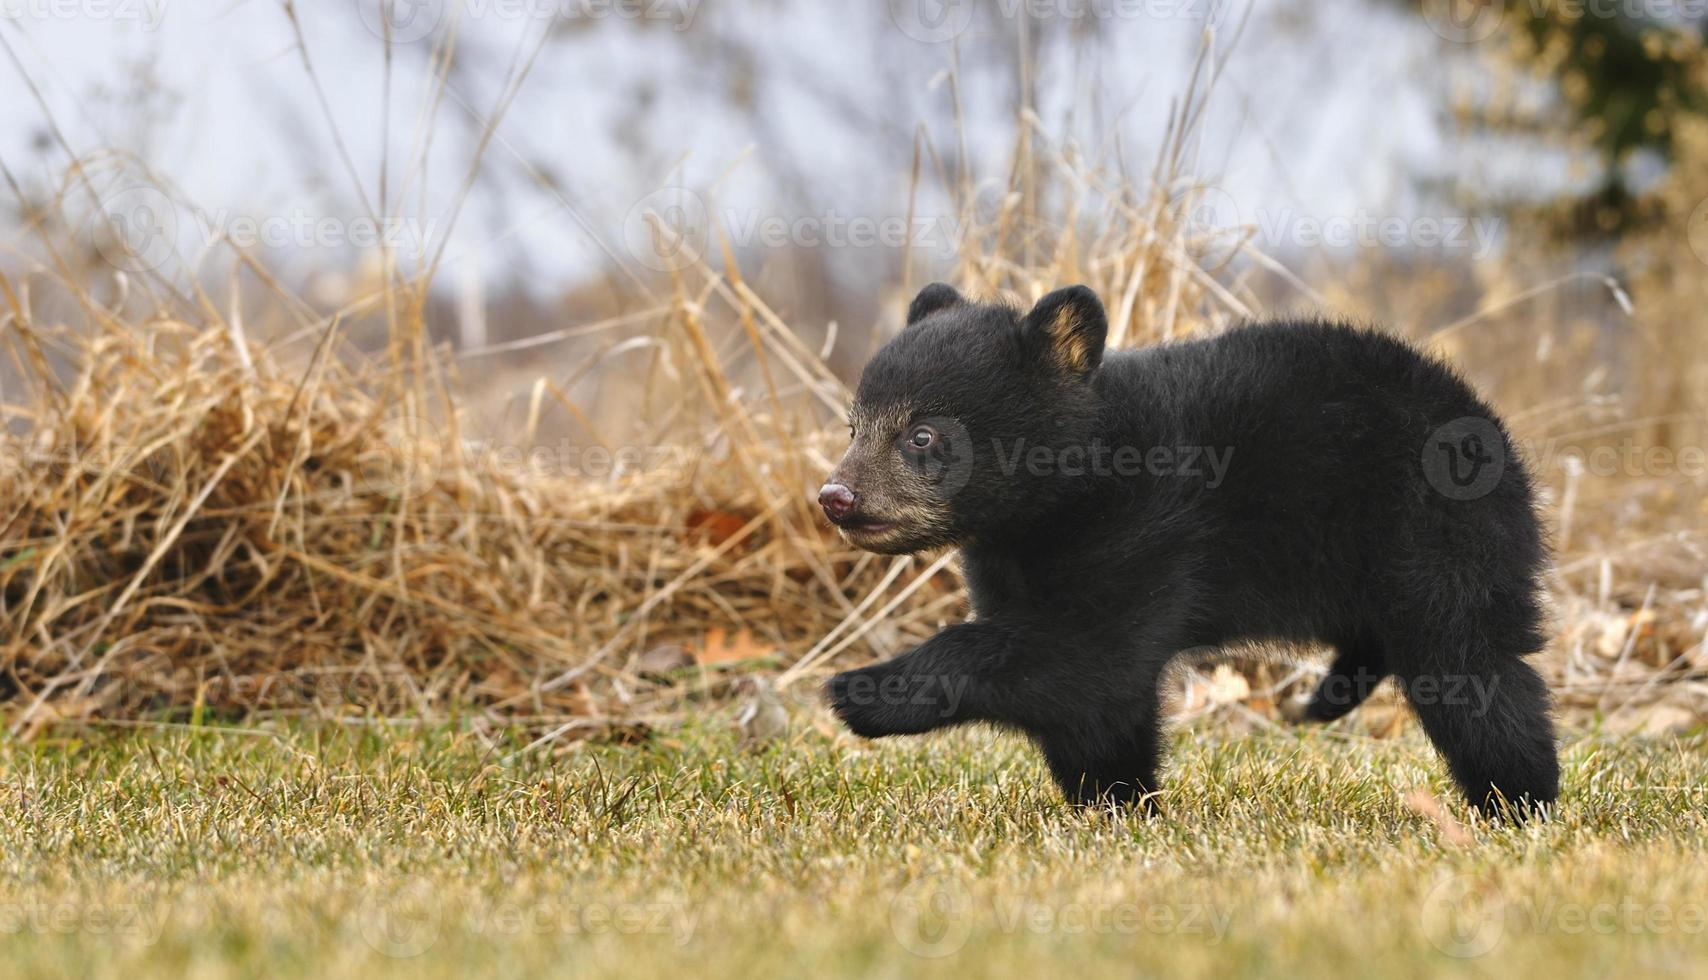 amerikansk svartbjörnkub (ursus americanus) kör över gräset foto